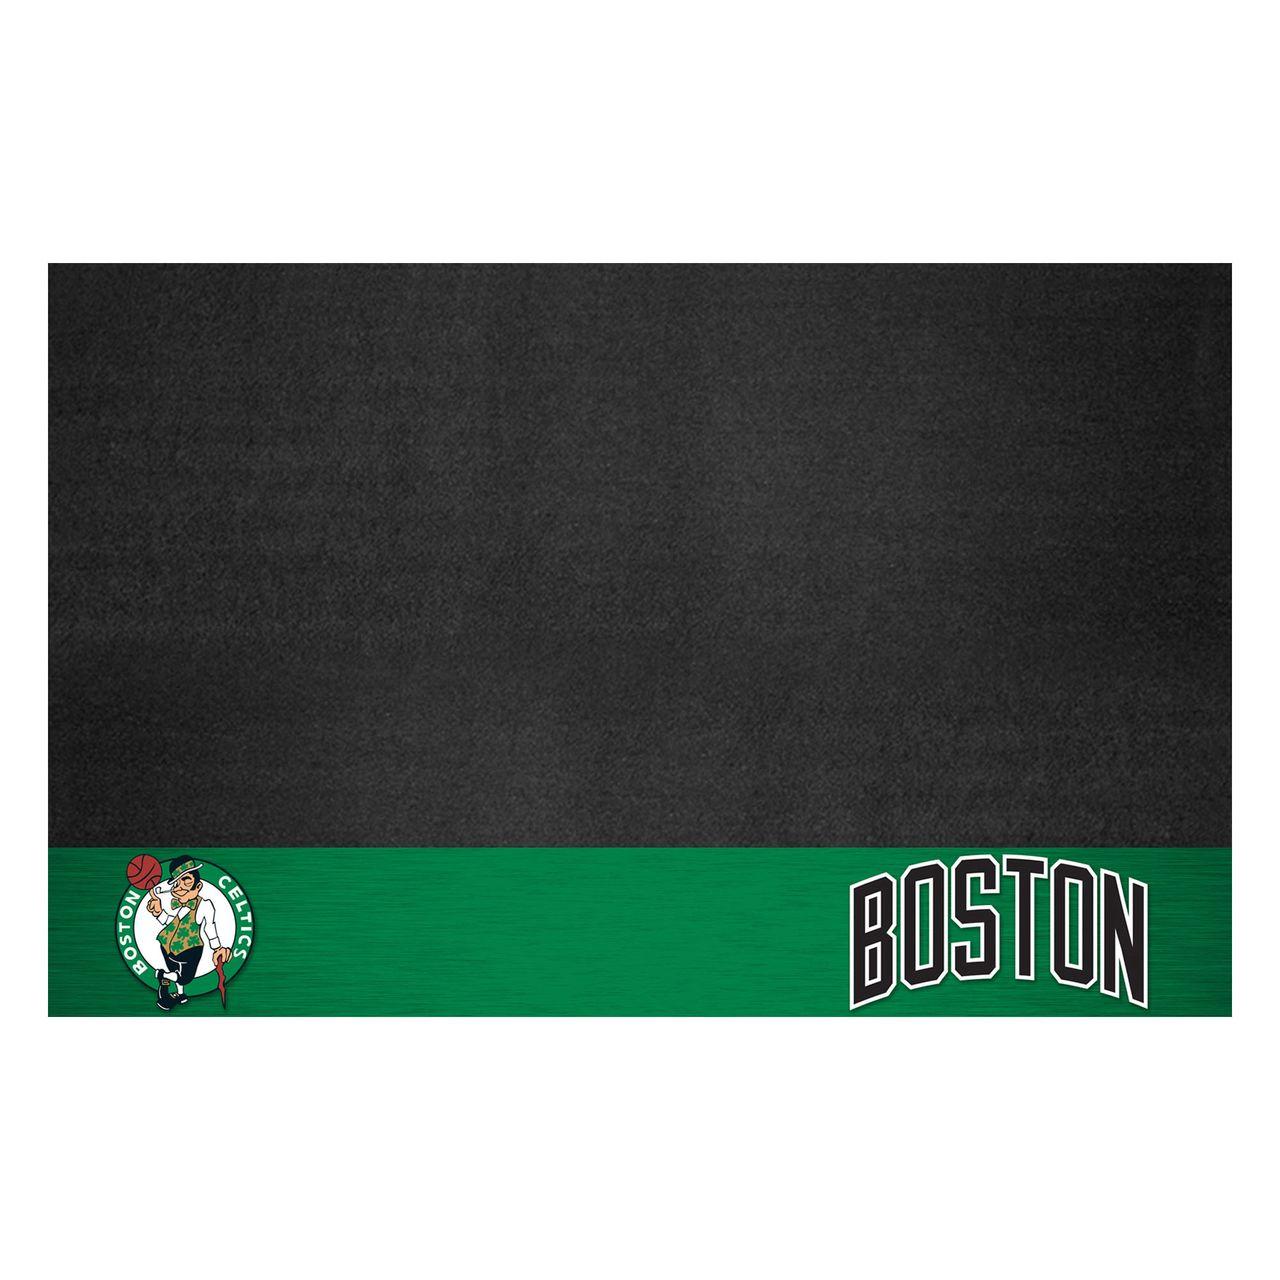 "Fanmats 14196 NBA - Boston Celtics Grill Mat 26""x42"""